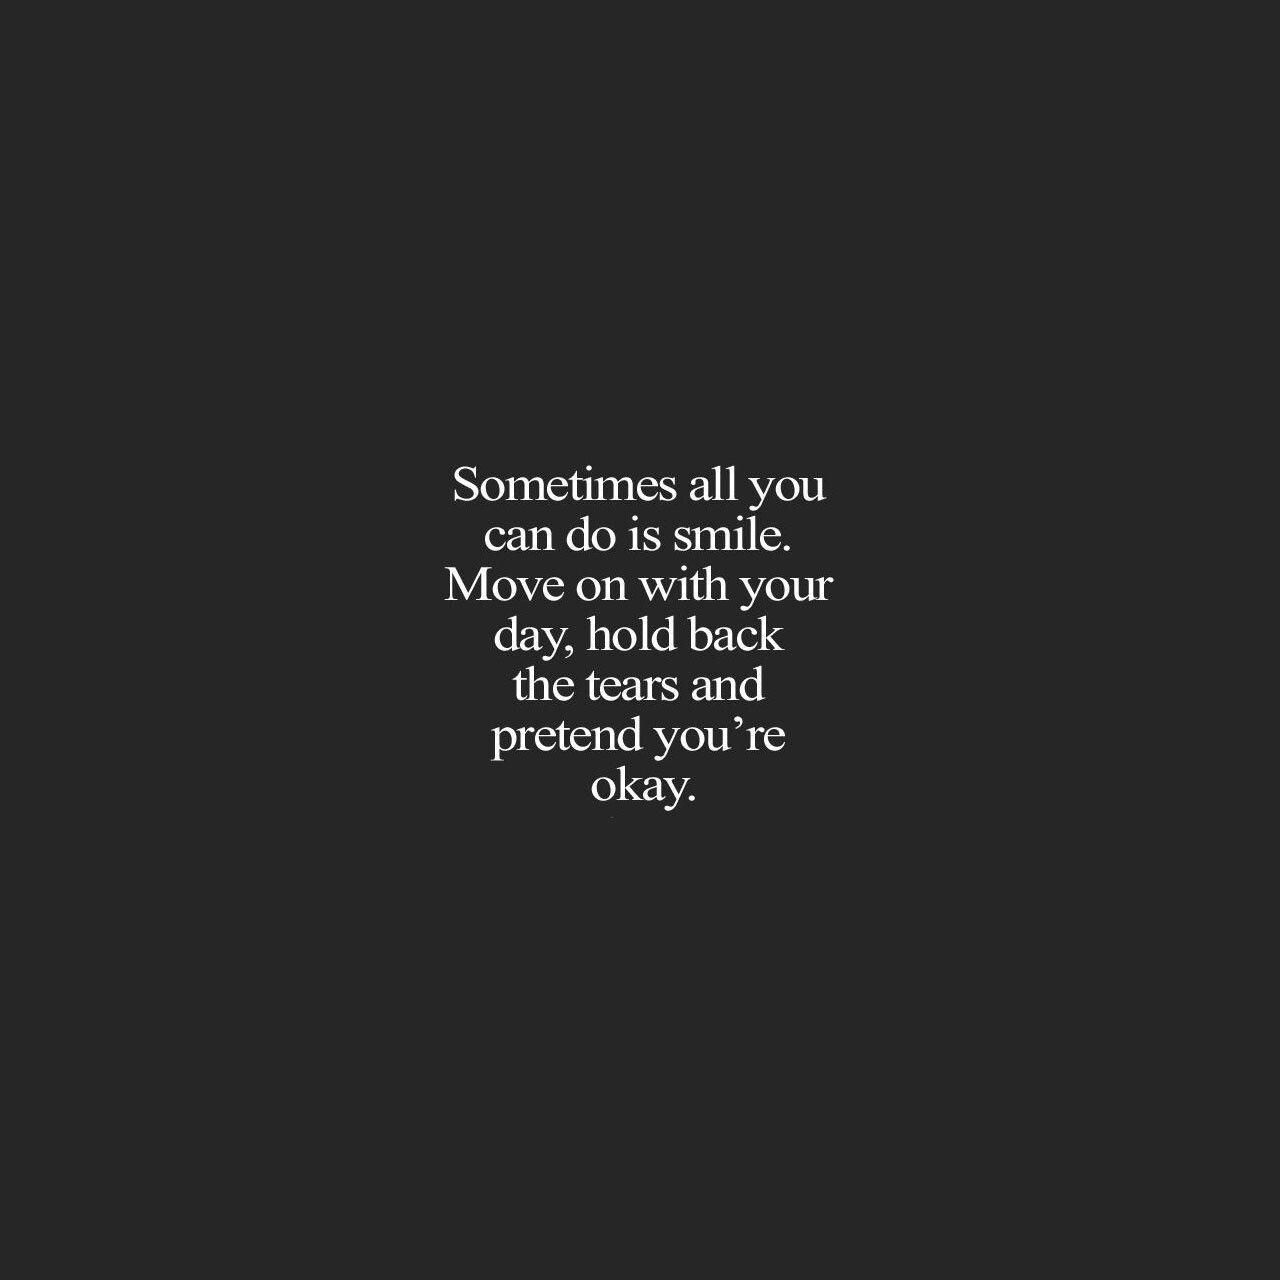 Depression Quote Unhappy Sad Sadness Depression Quote Stress Депрессия Стресс